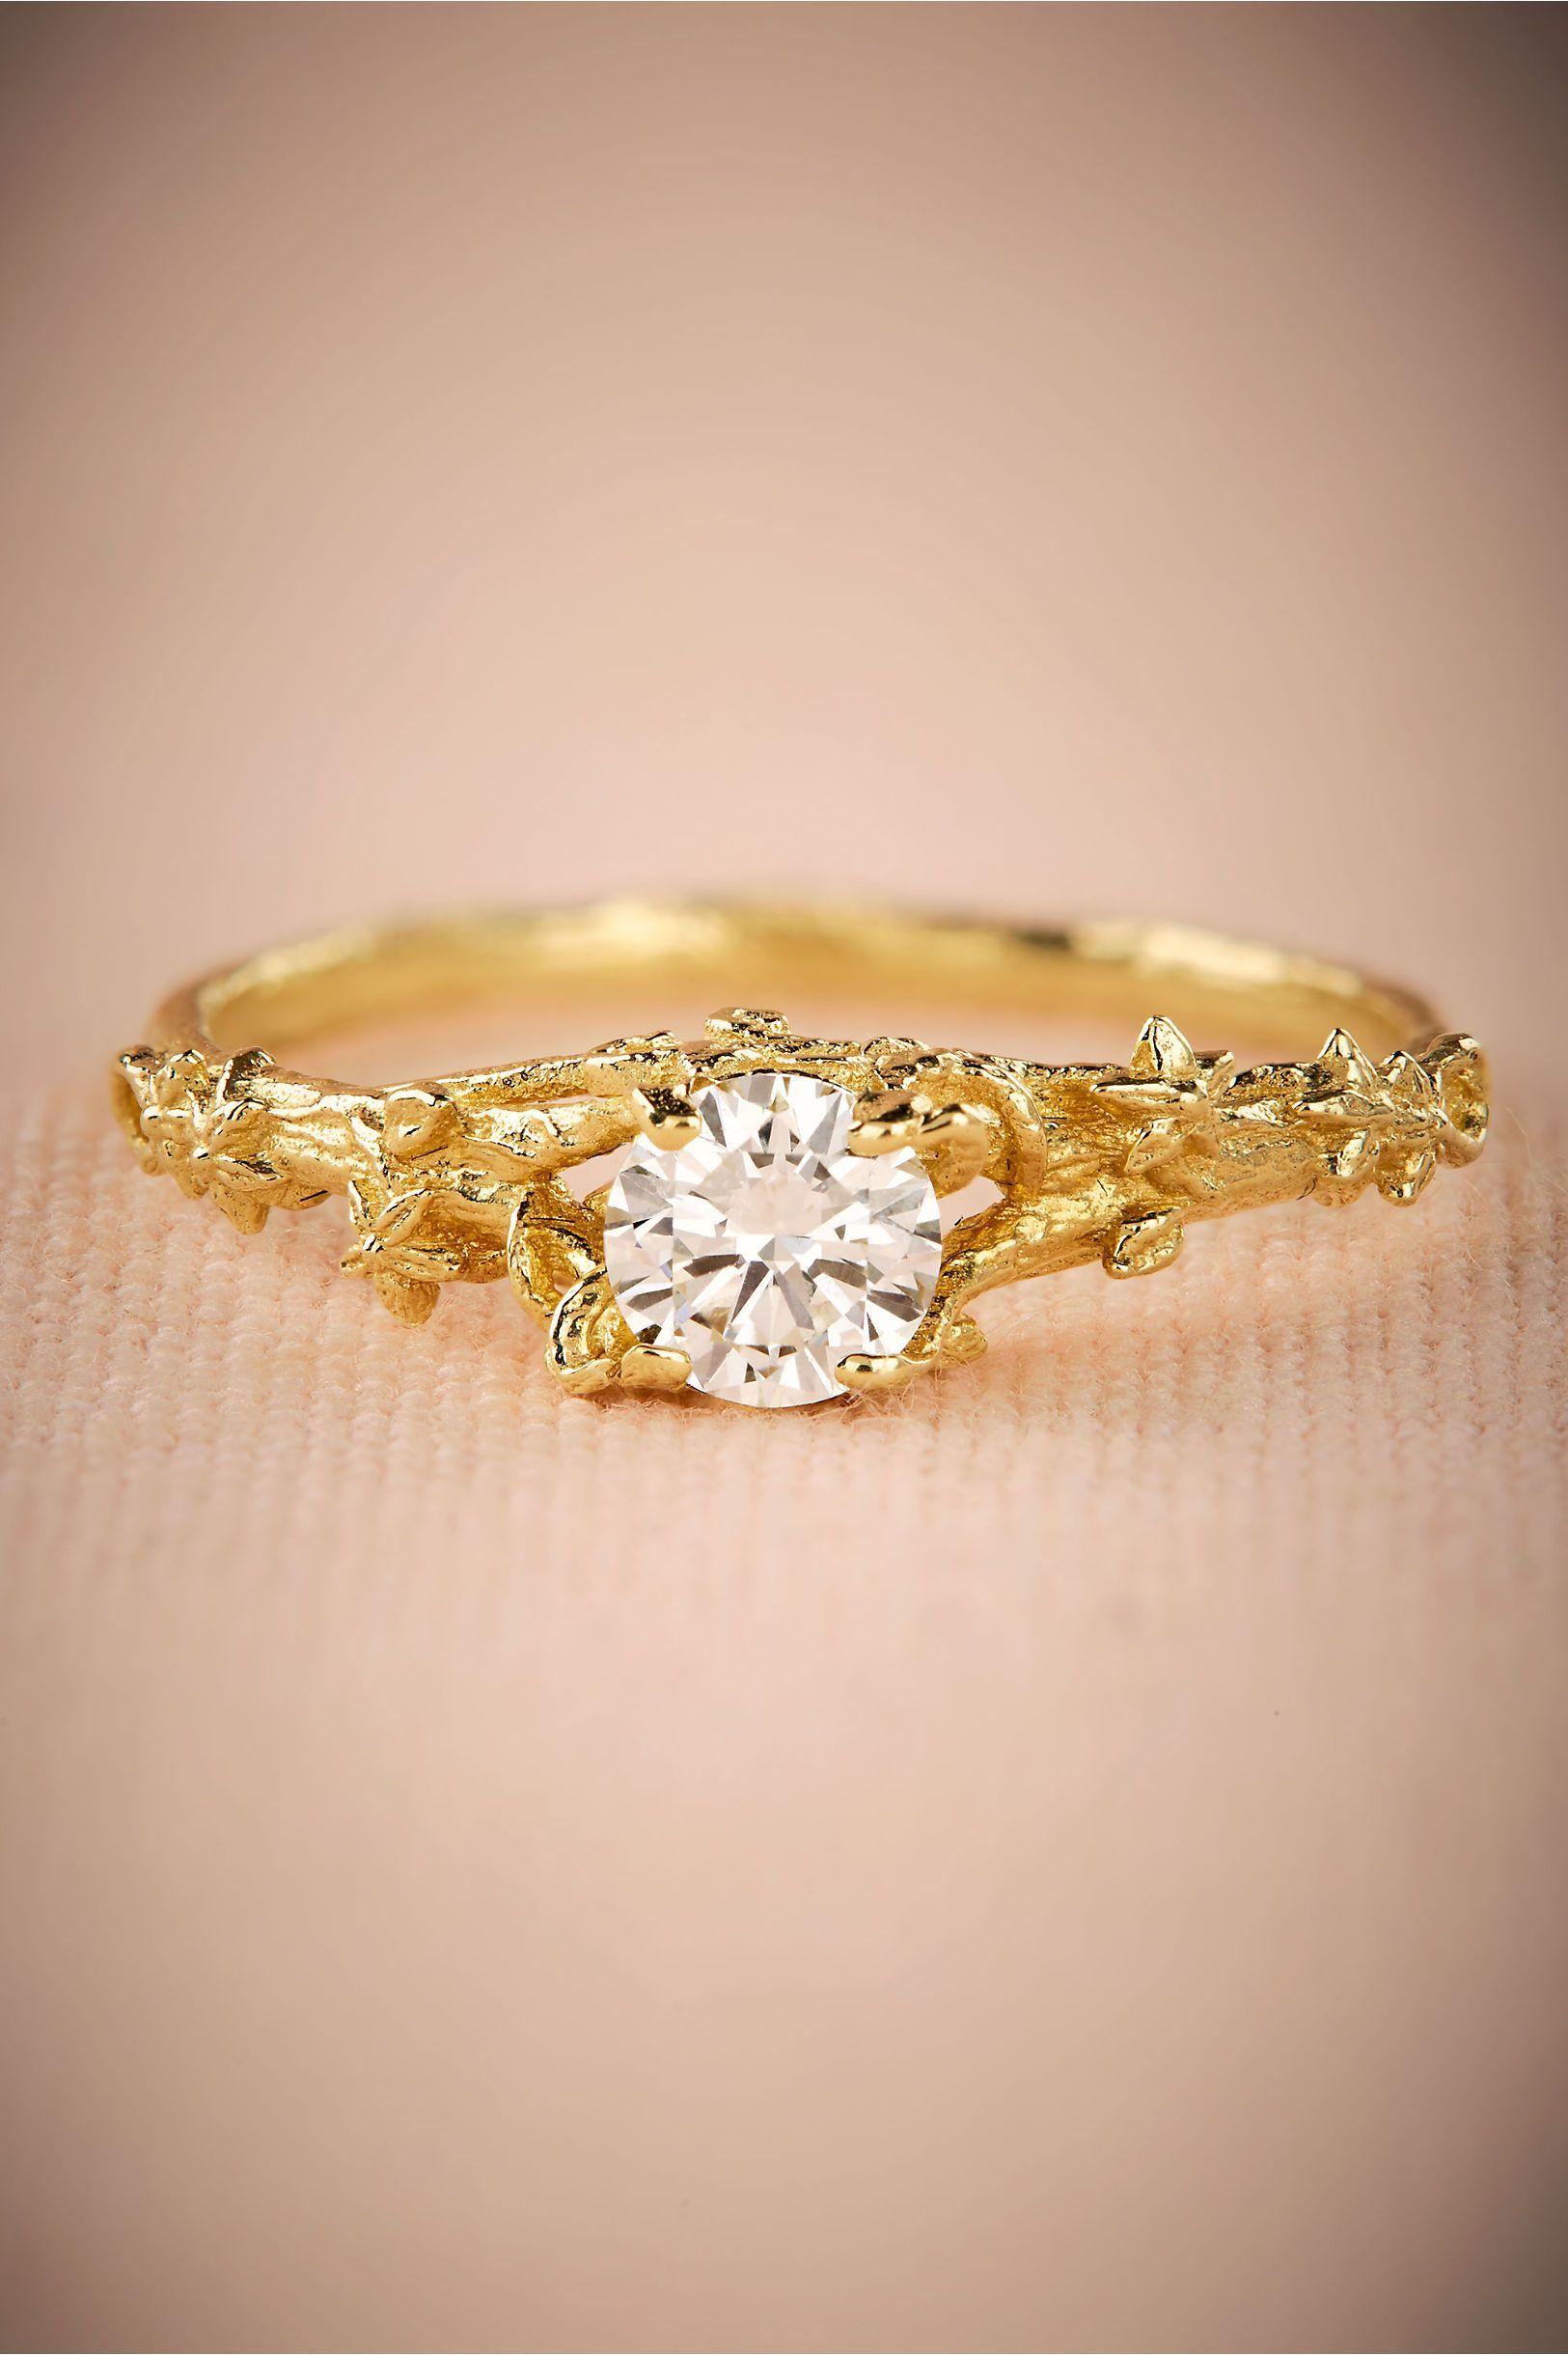 Vigne Diamond Engagement Ring From Bhldn